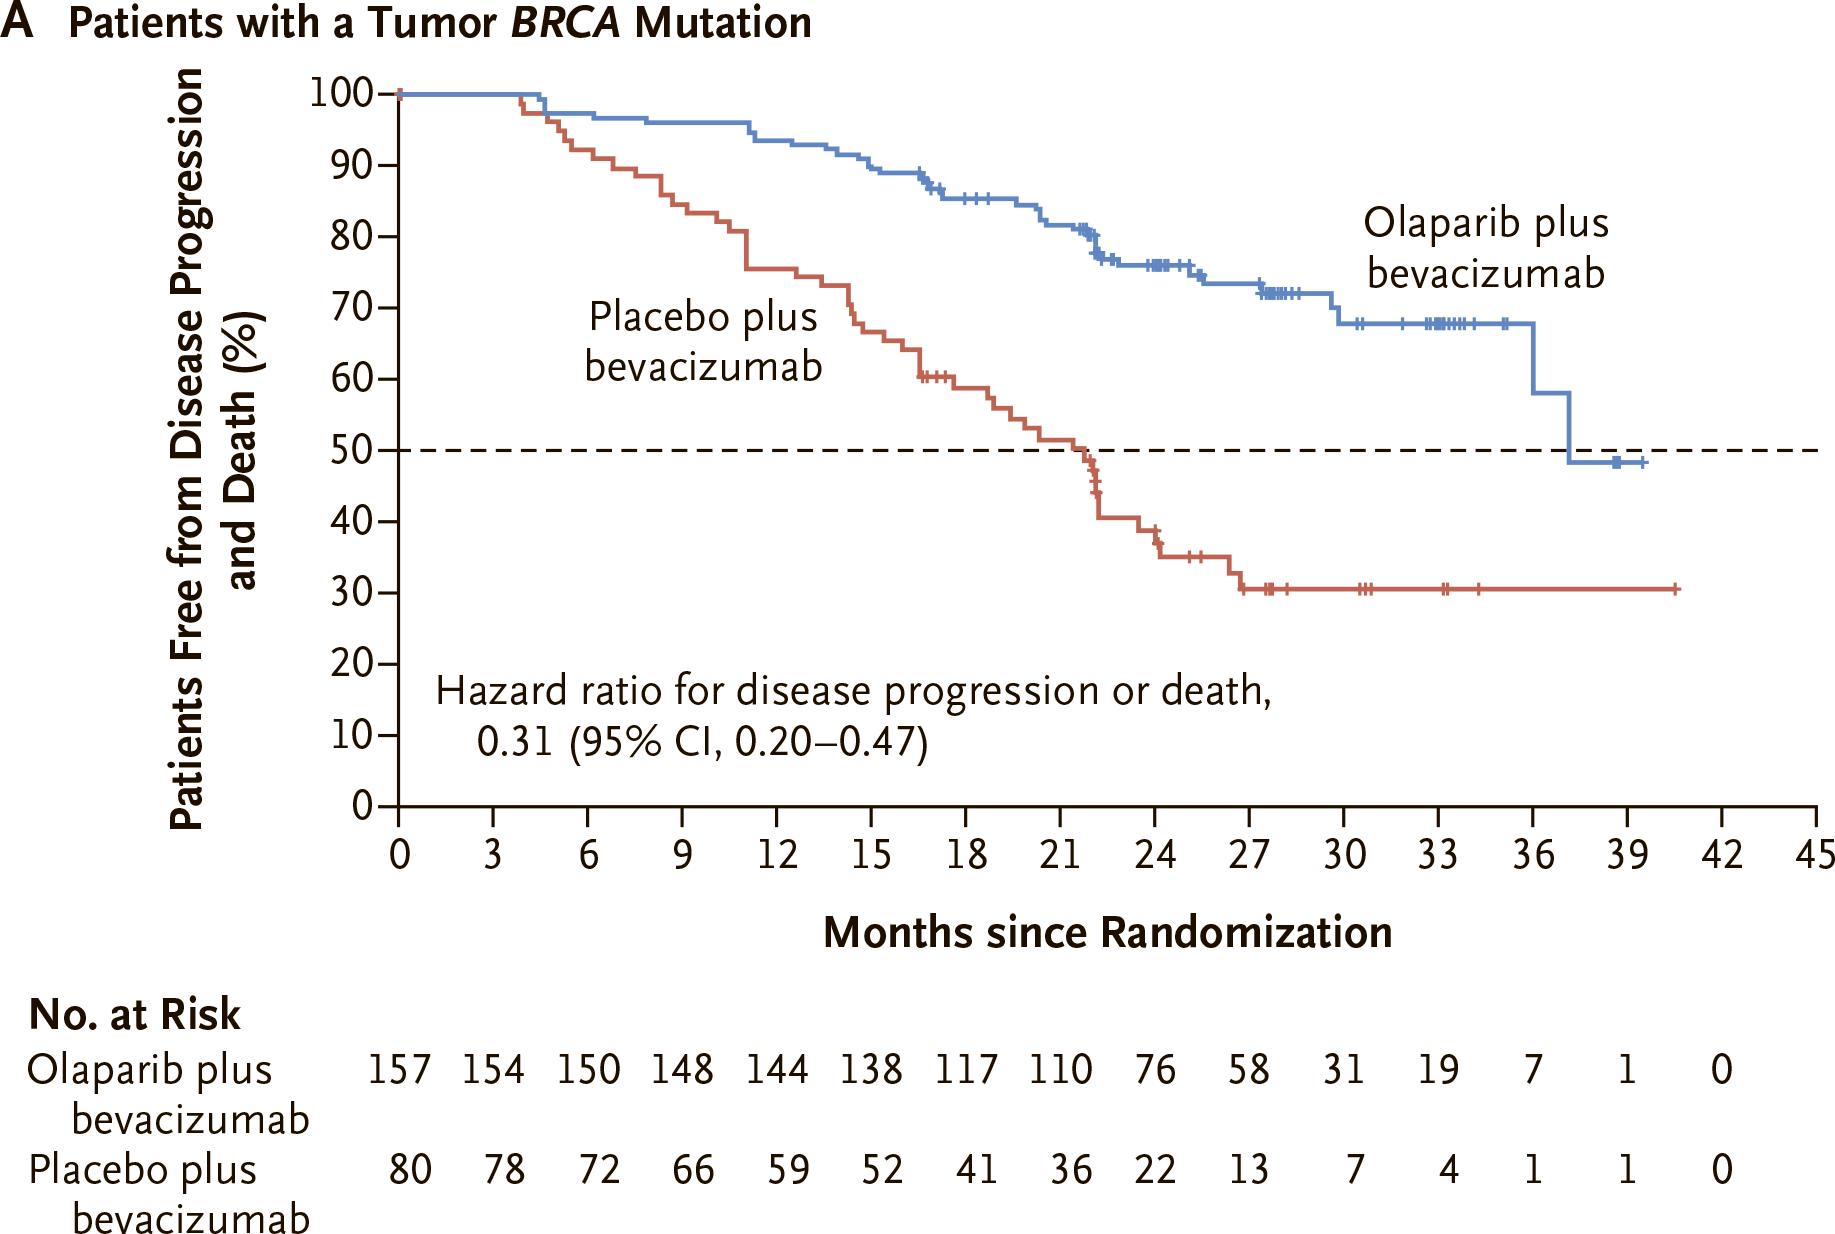 nct02477644 results 02 - «Линпарза» плюс «Авастин»: поддерживающая терапия рака яичников